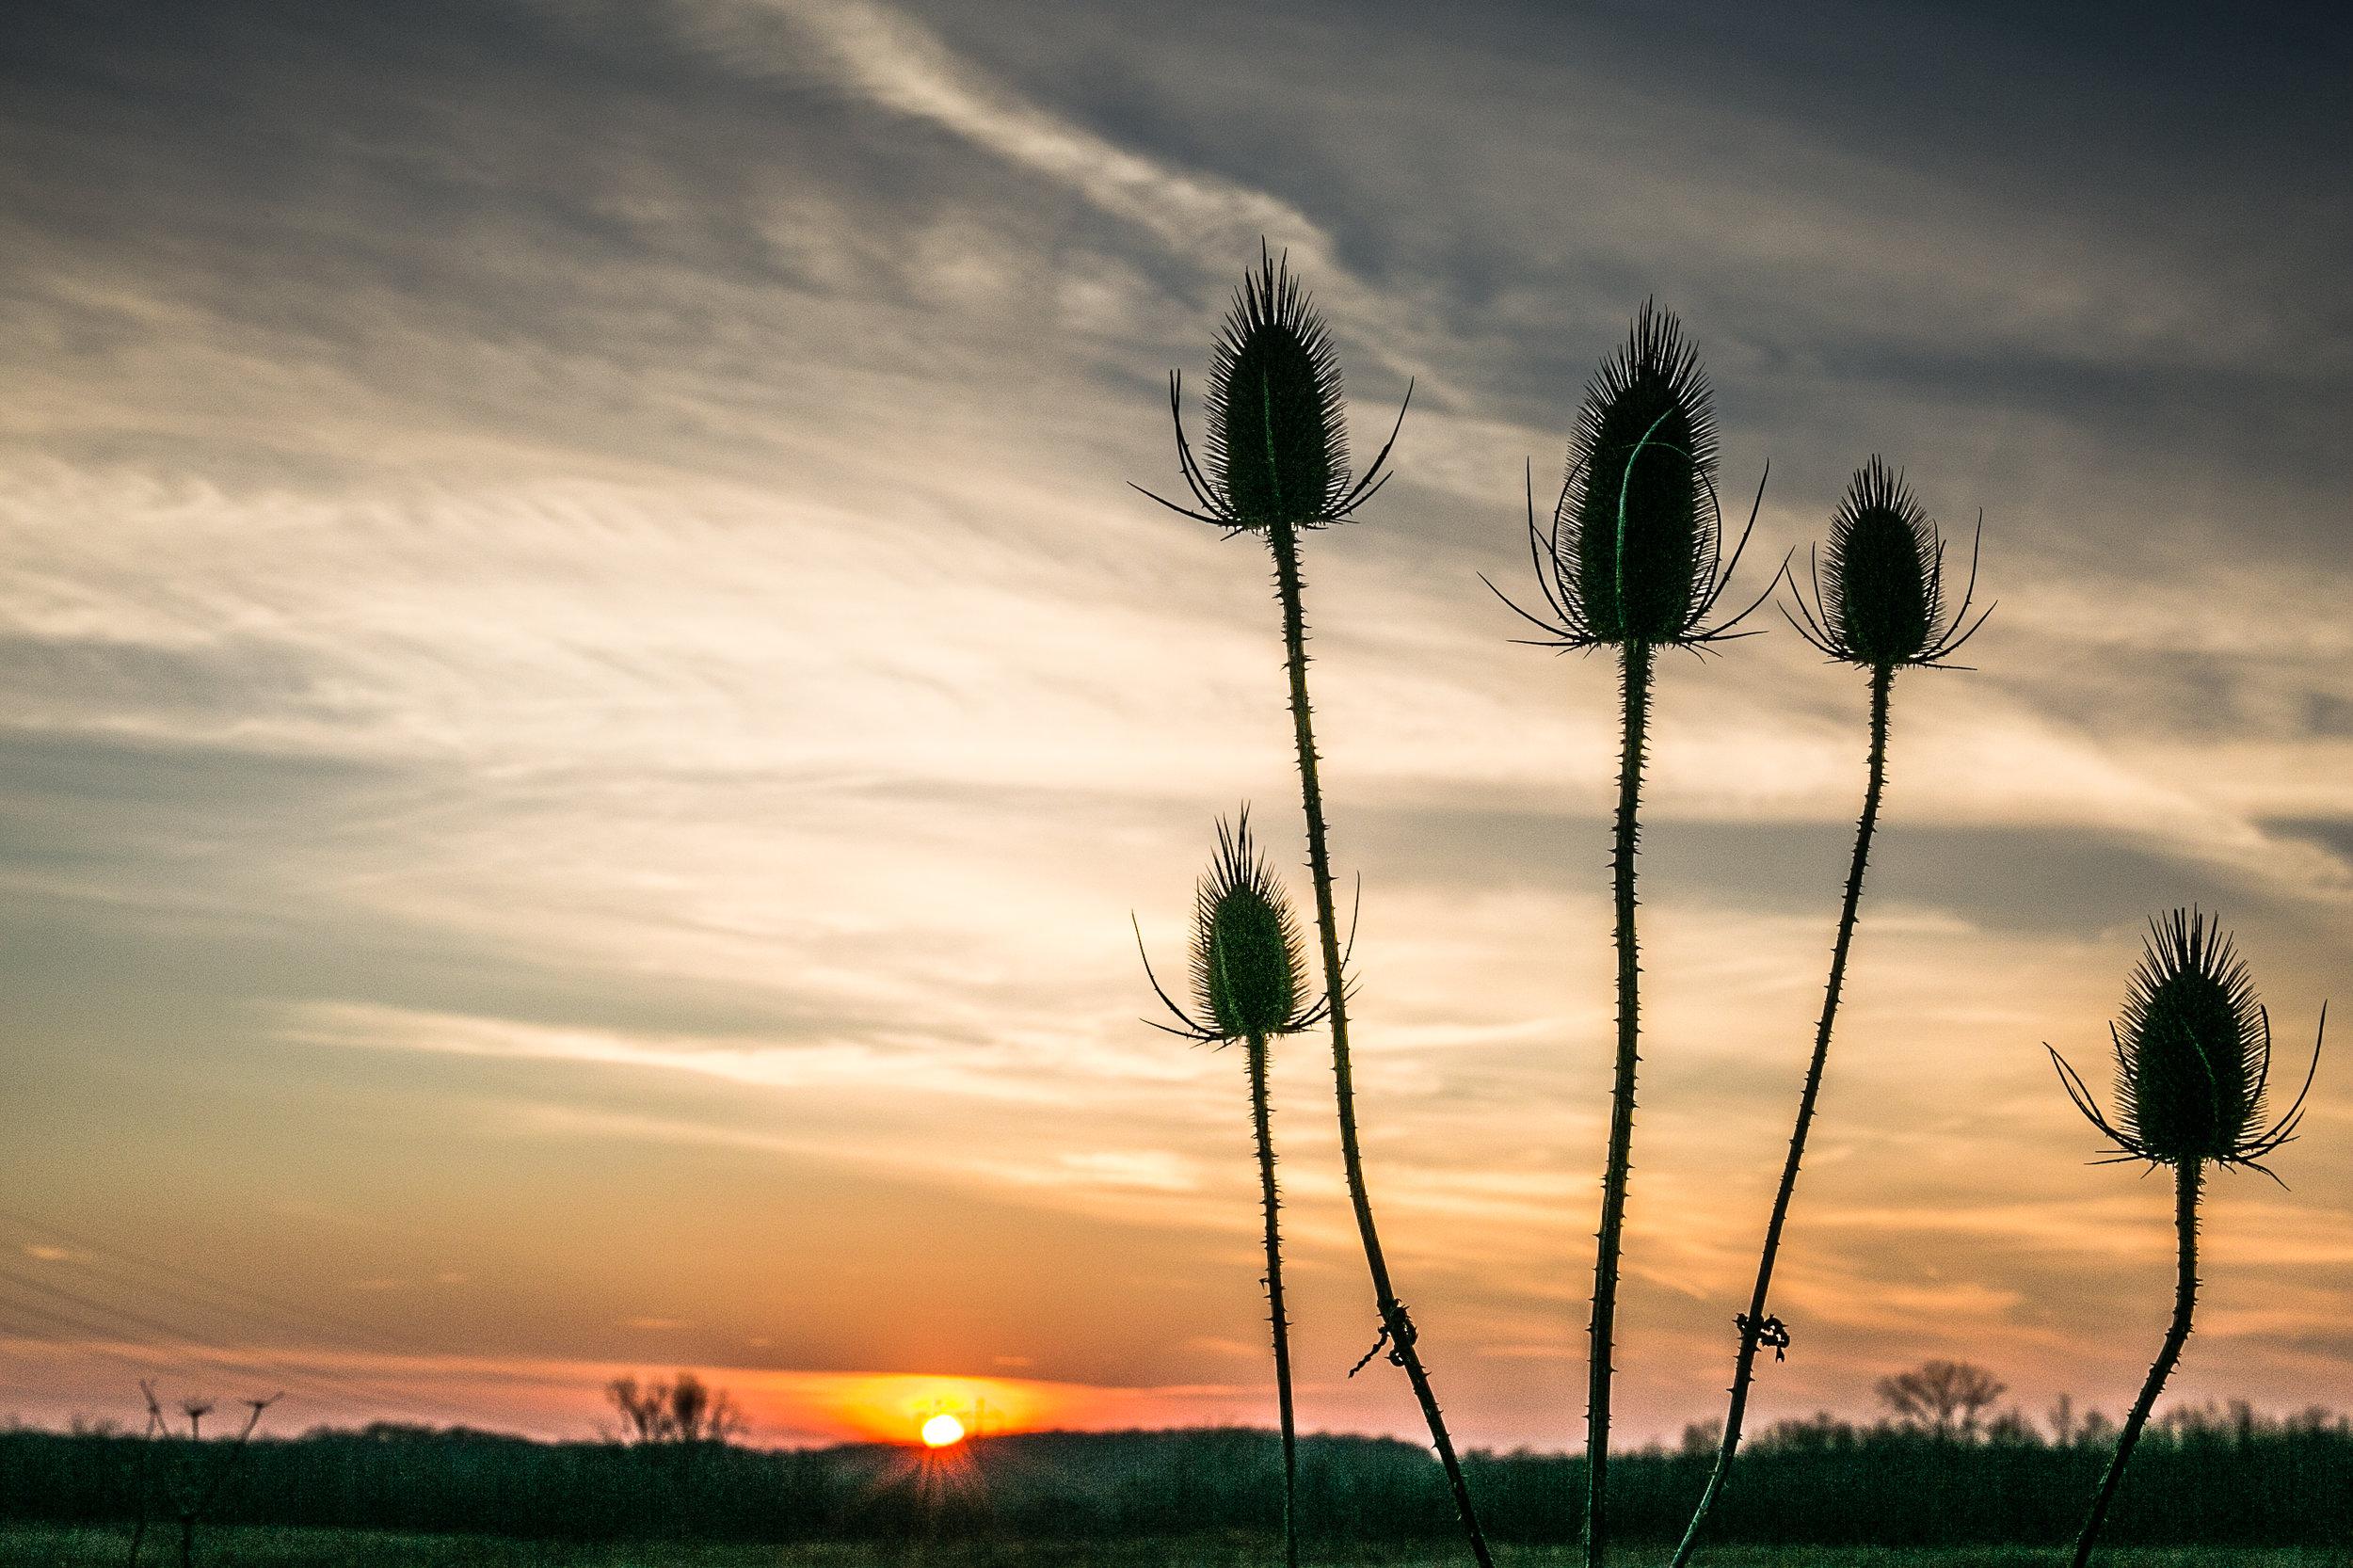 sunset over darby.jpg